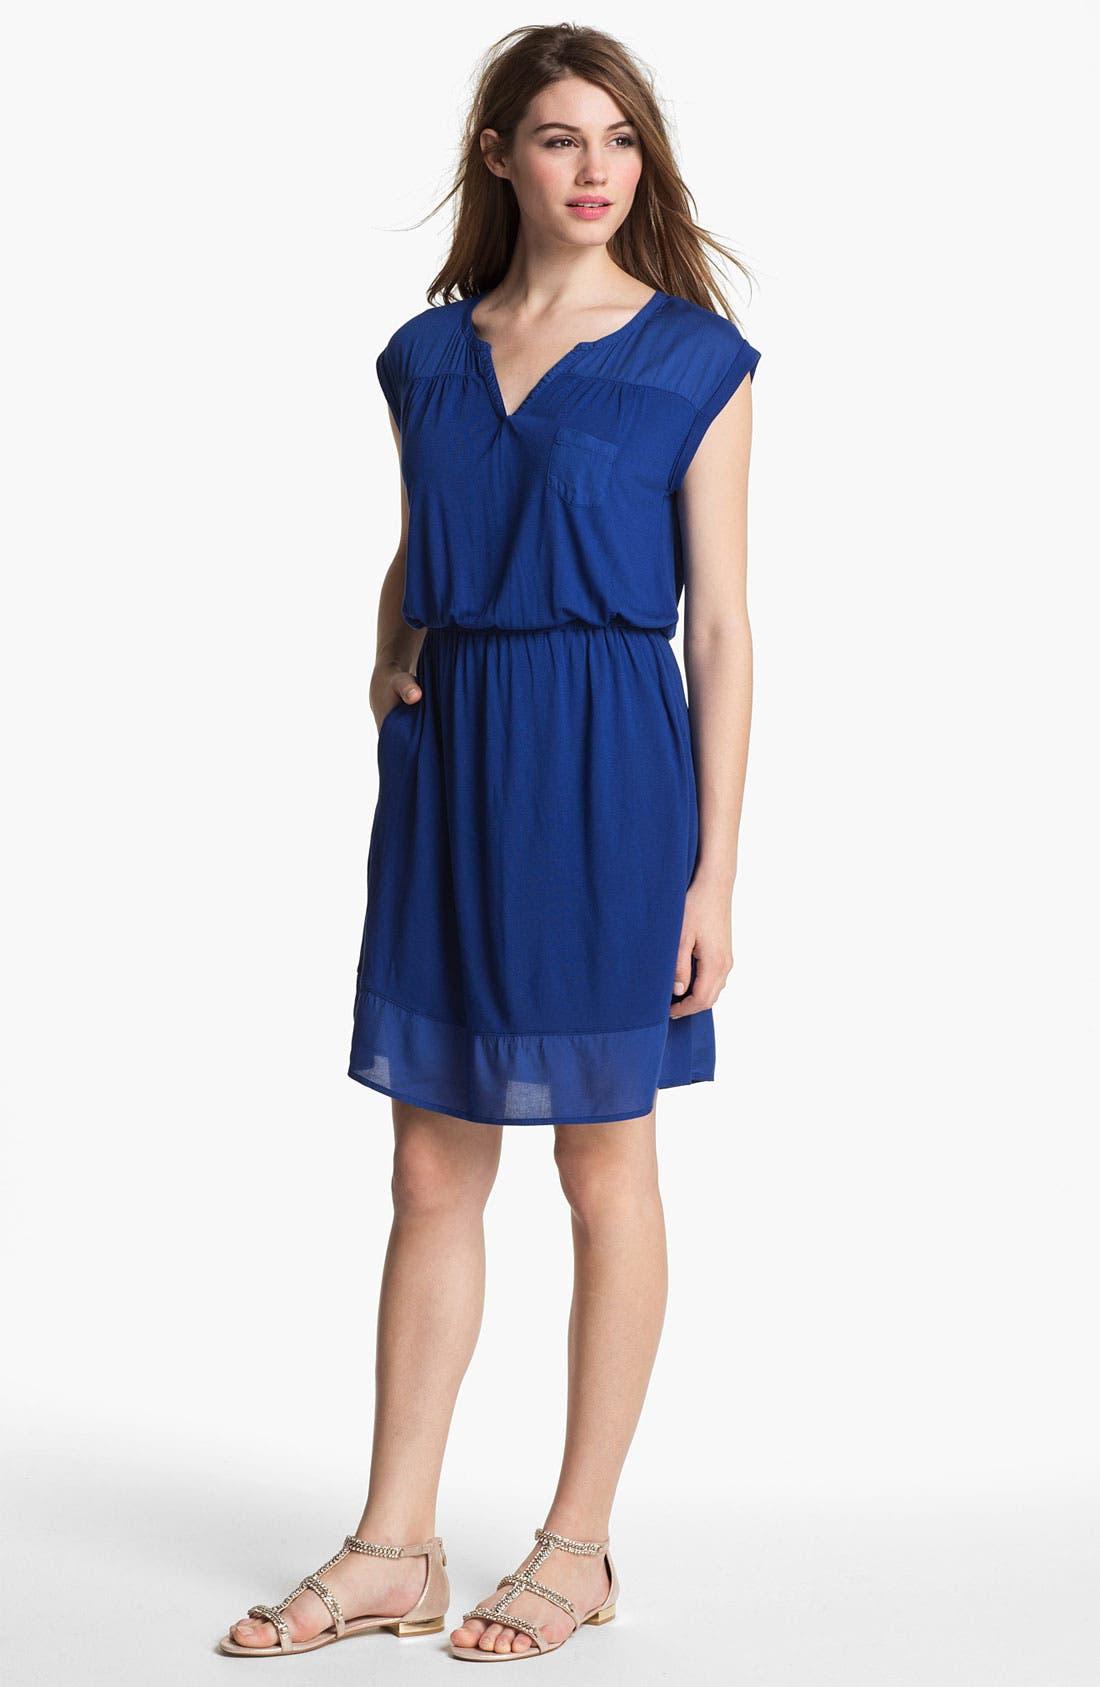 Alternate Image 1 Selected - Caslon Mixed Media Dress